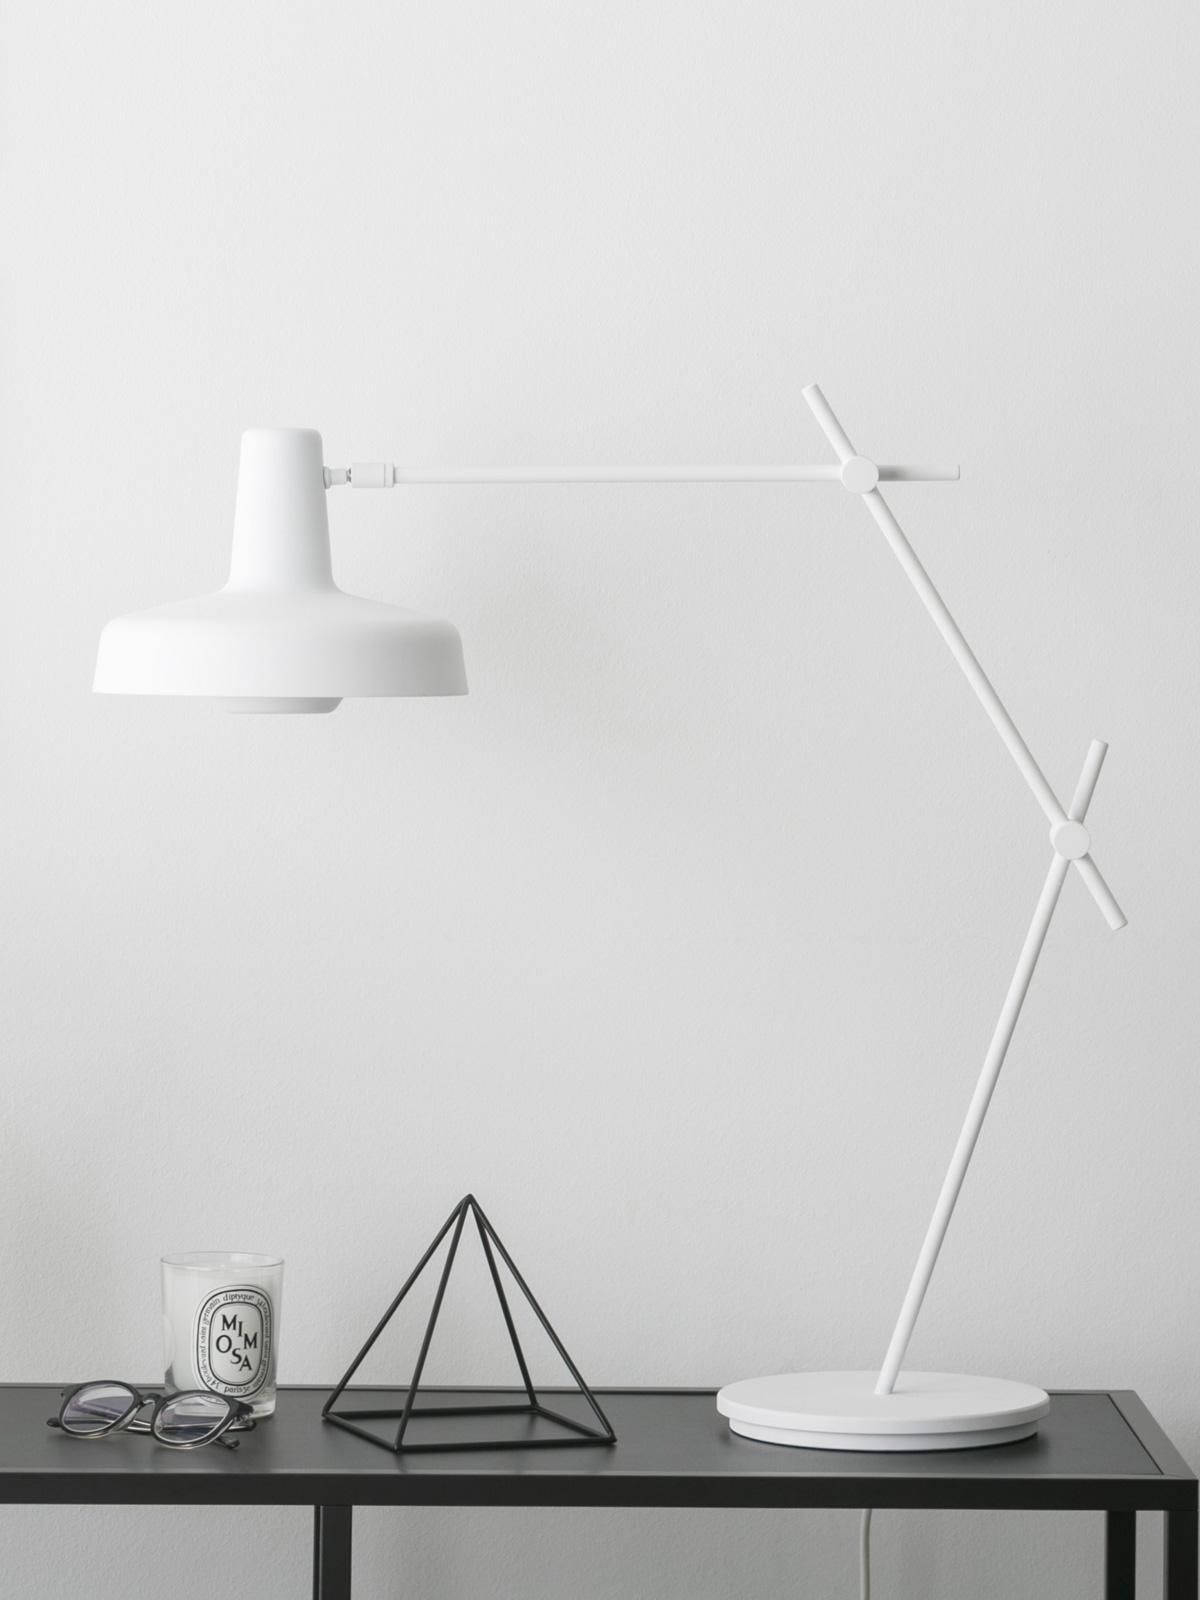 Tisch Lampe Arigato Grupa Products